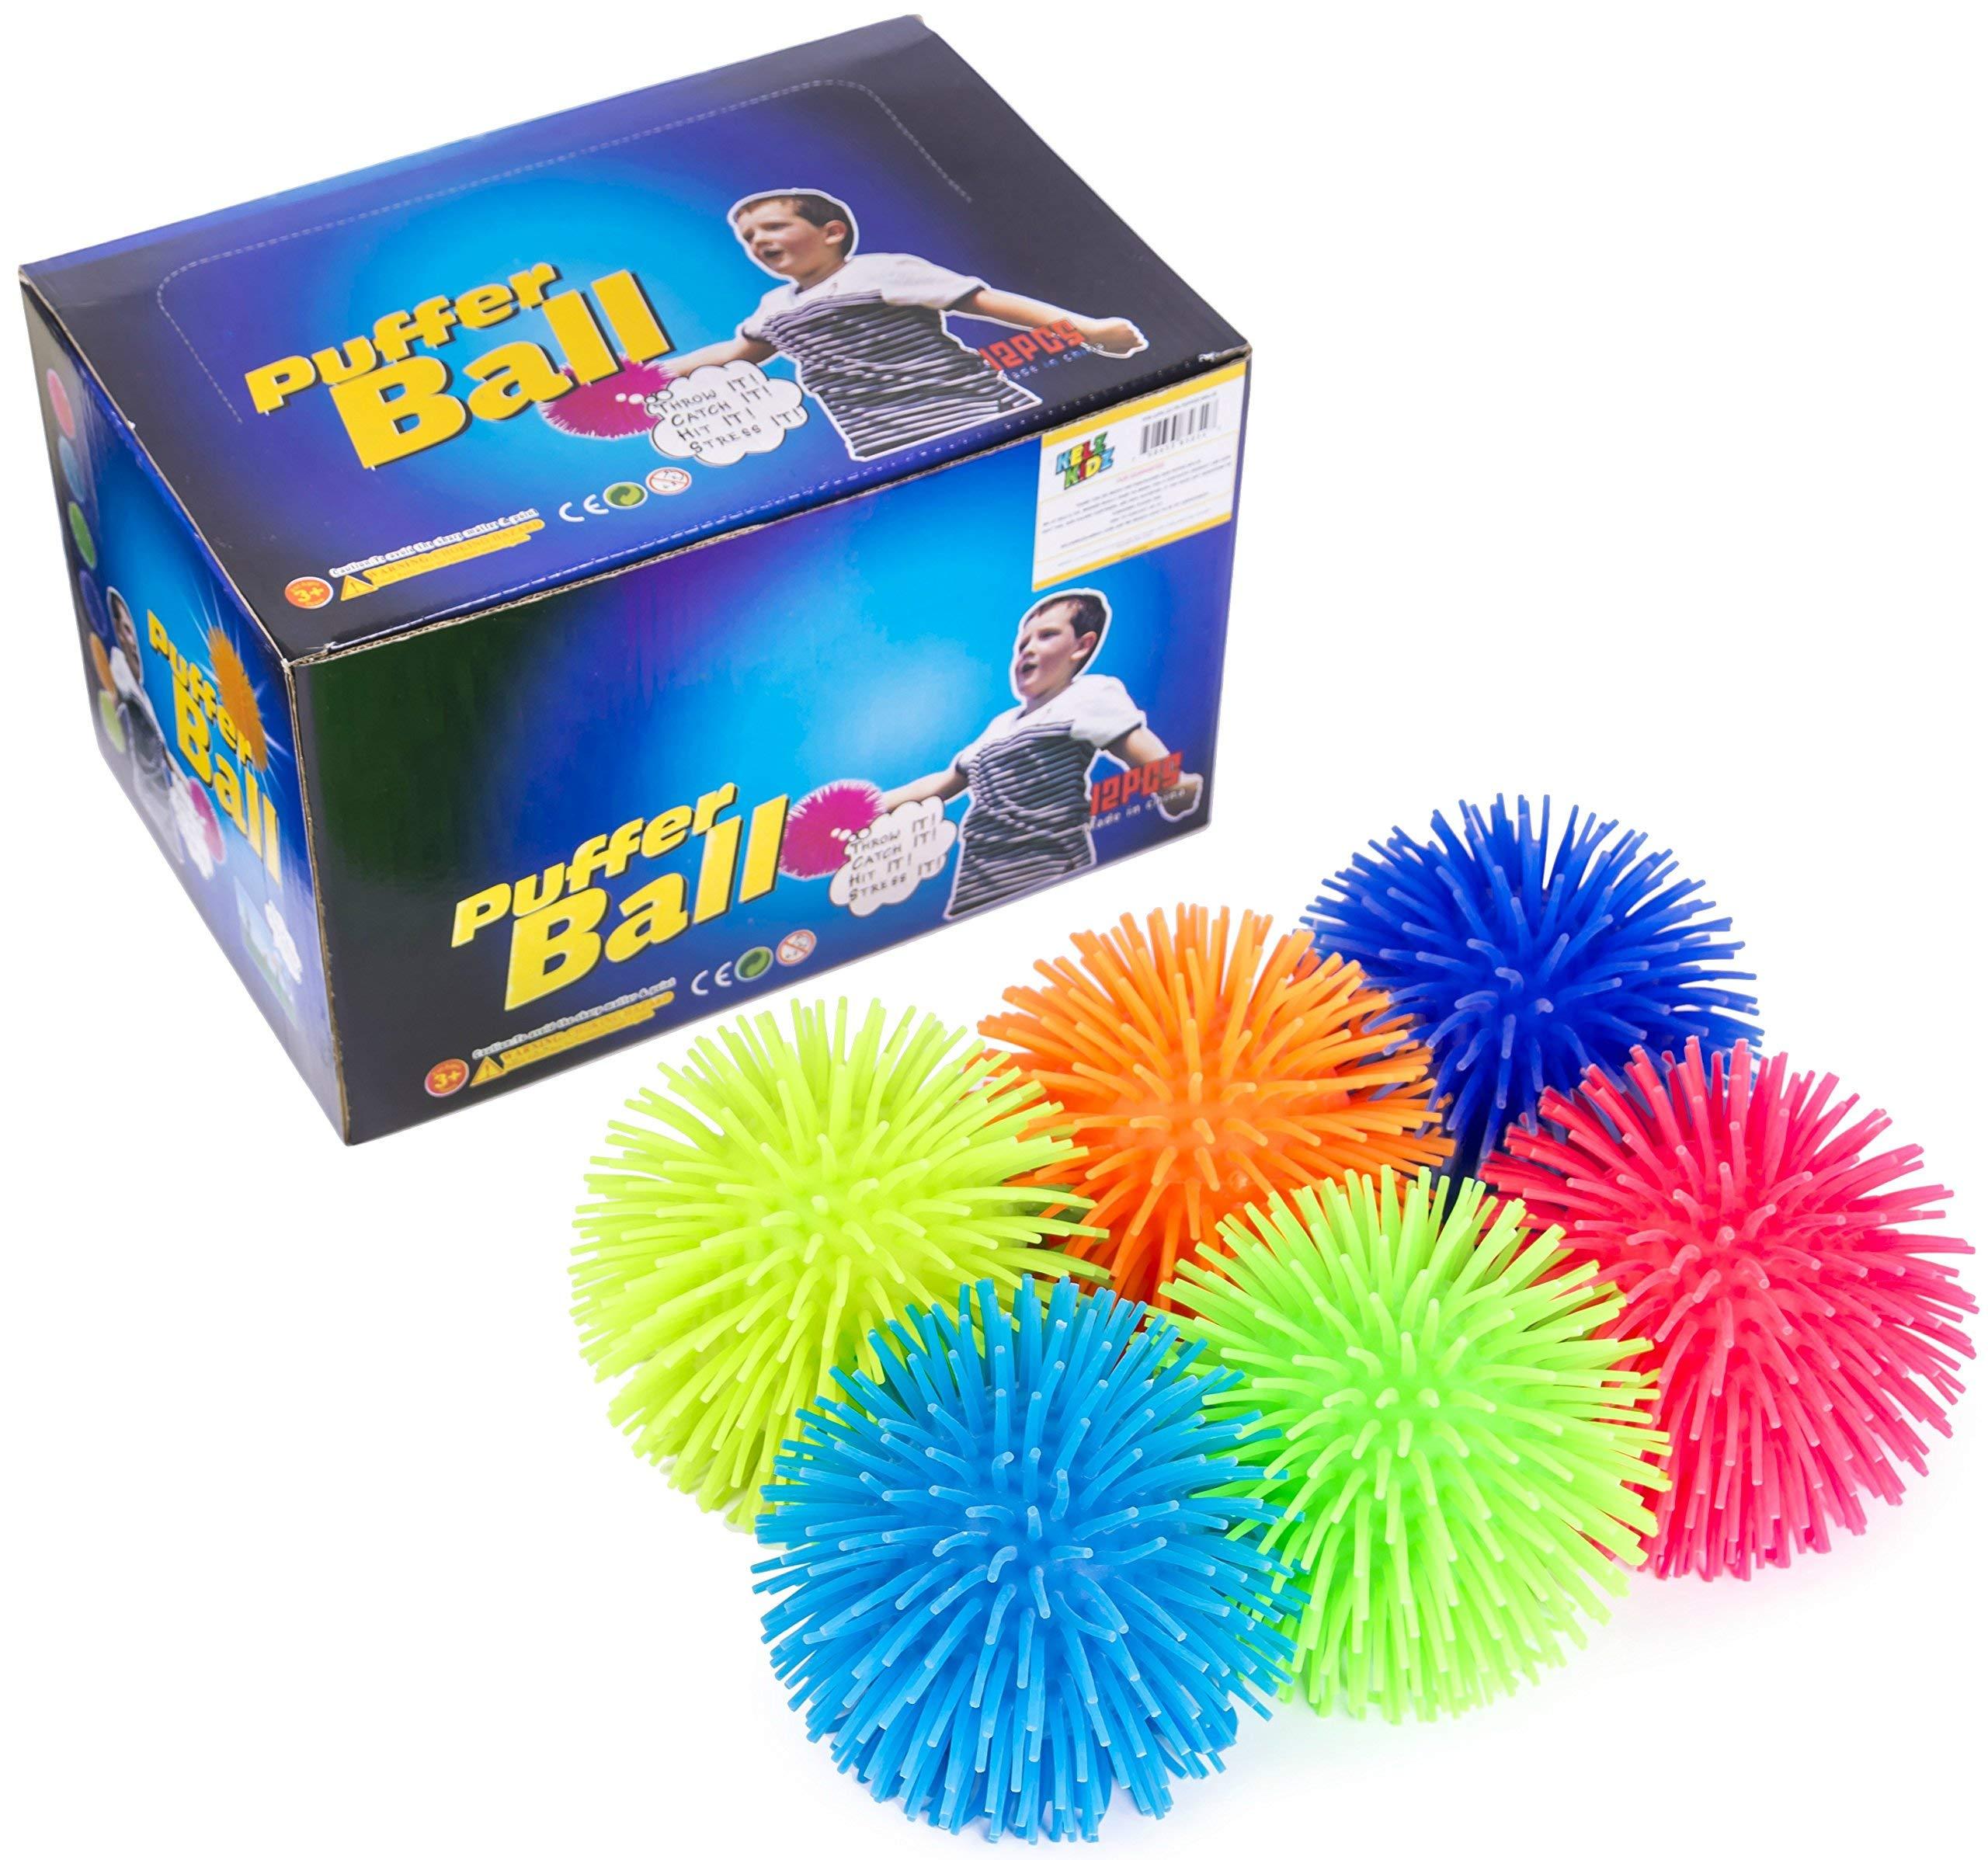 KELZ KIDZ Premium Quality Large & Thick Puffer Balls for Fun Kids Party (Set of 12) by KELZ KIDZ (Image #3)